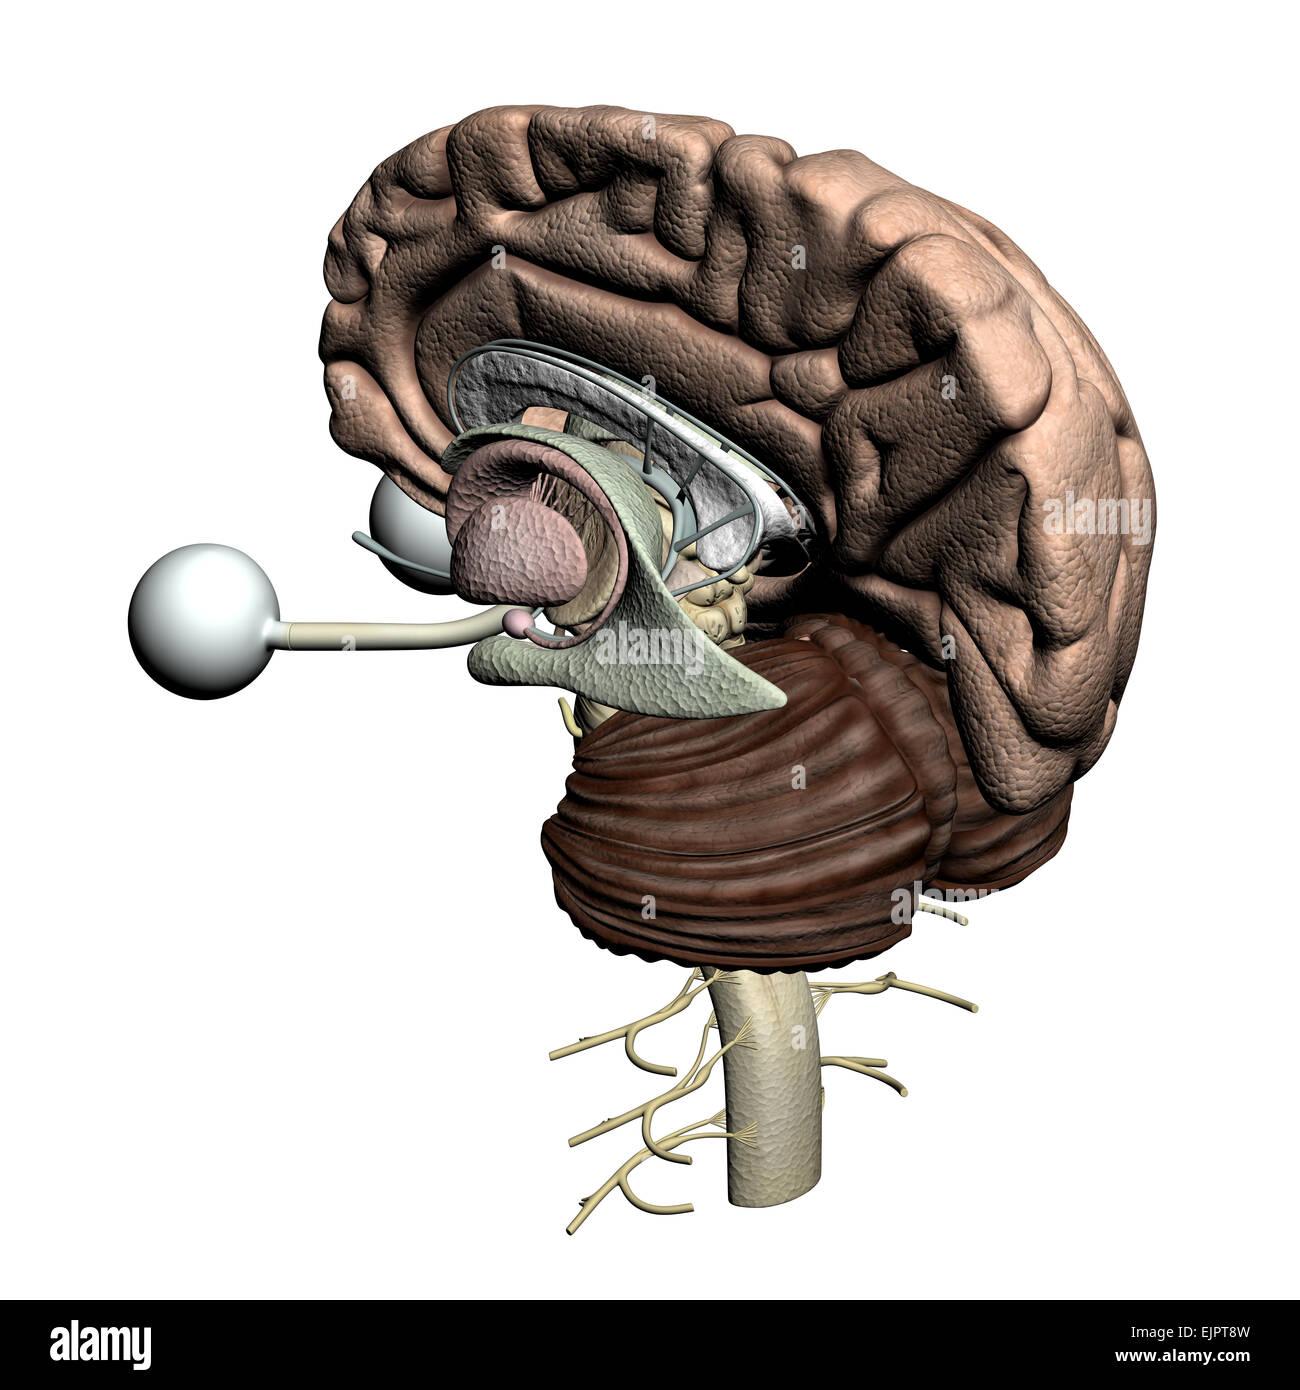 Anatomie Gehirn Querschnitt Stockfoto, Bild: 80407289 - Alamy